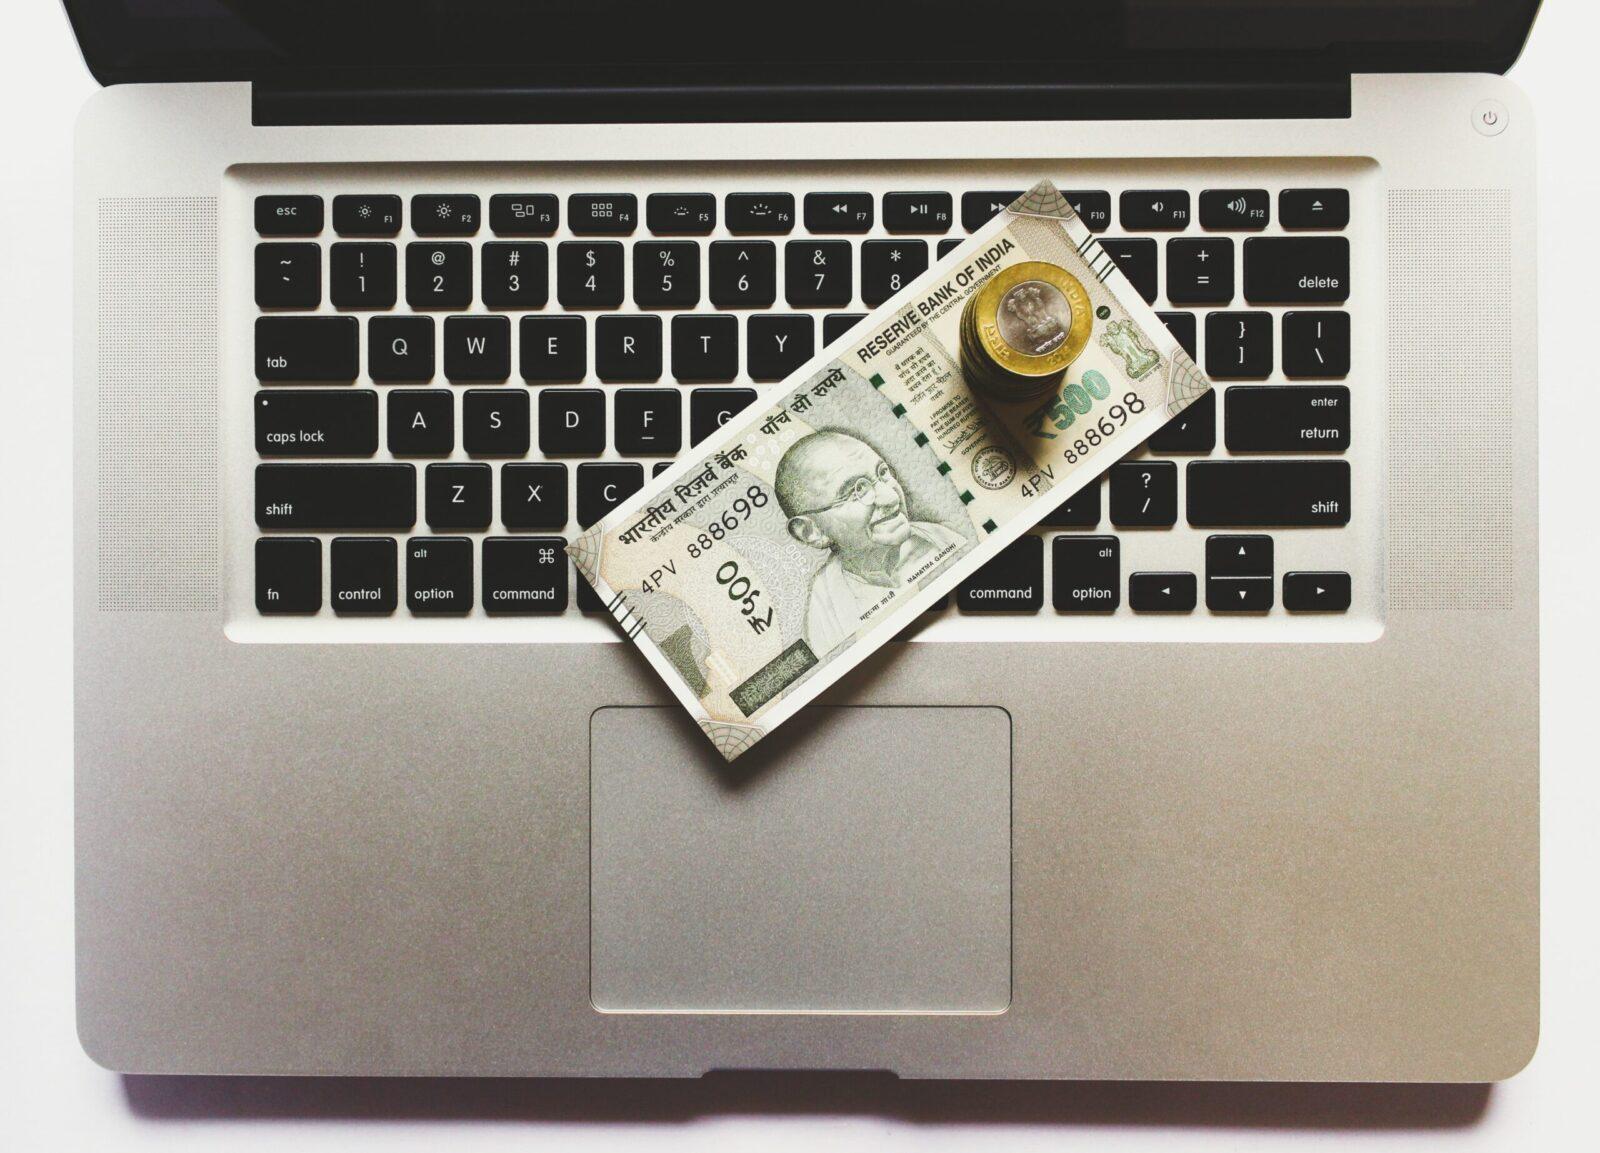 rupixen com 4kim7ed8f1a unsplash scaled - The War Of Wall Street Traders And Reddit Enthusiasts Investors Continues